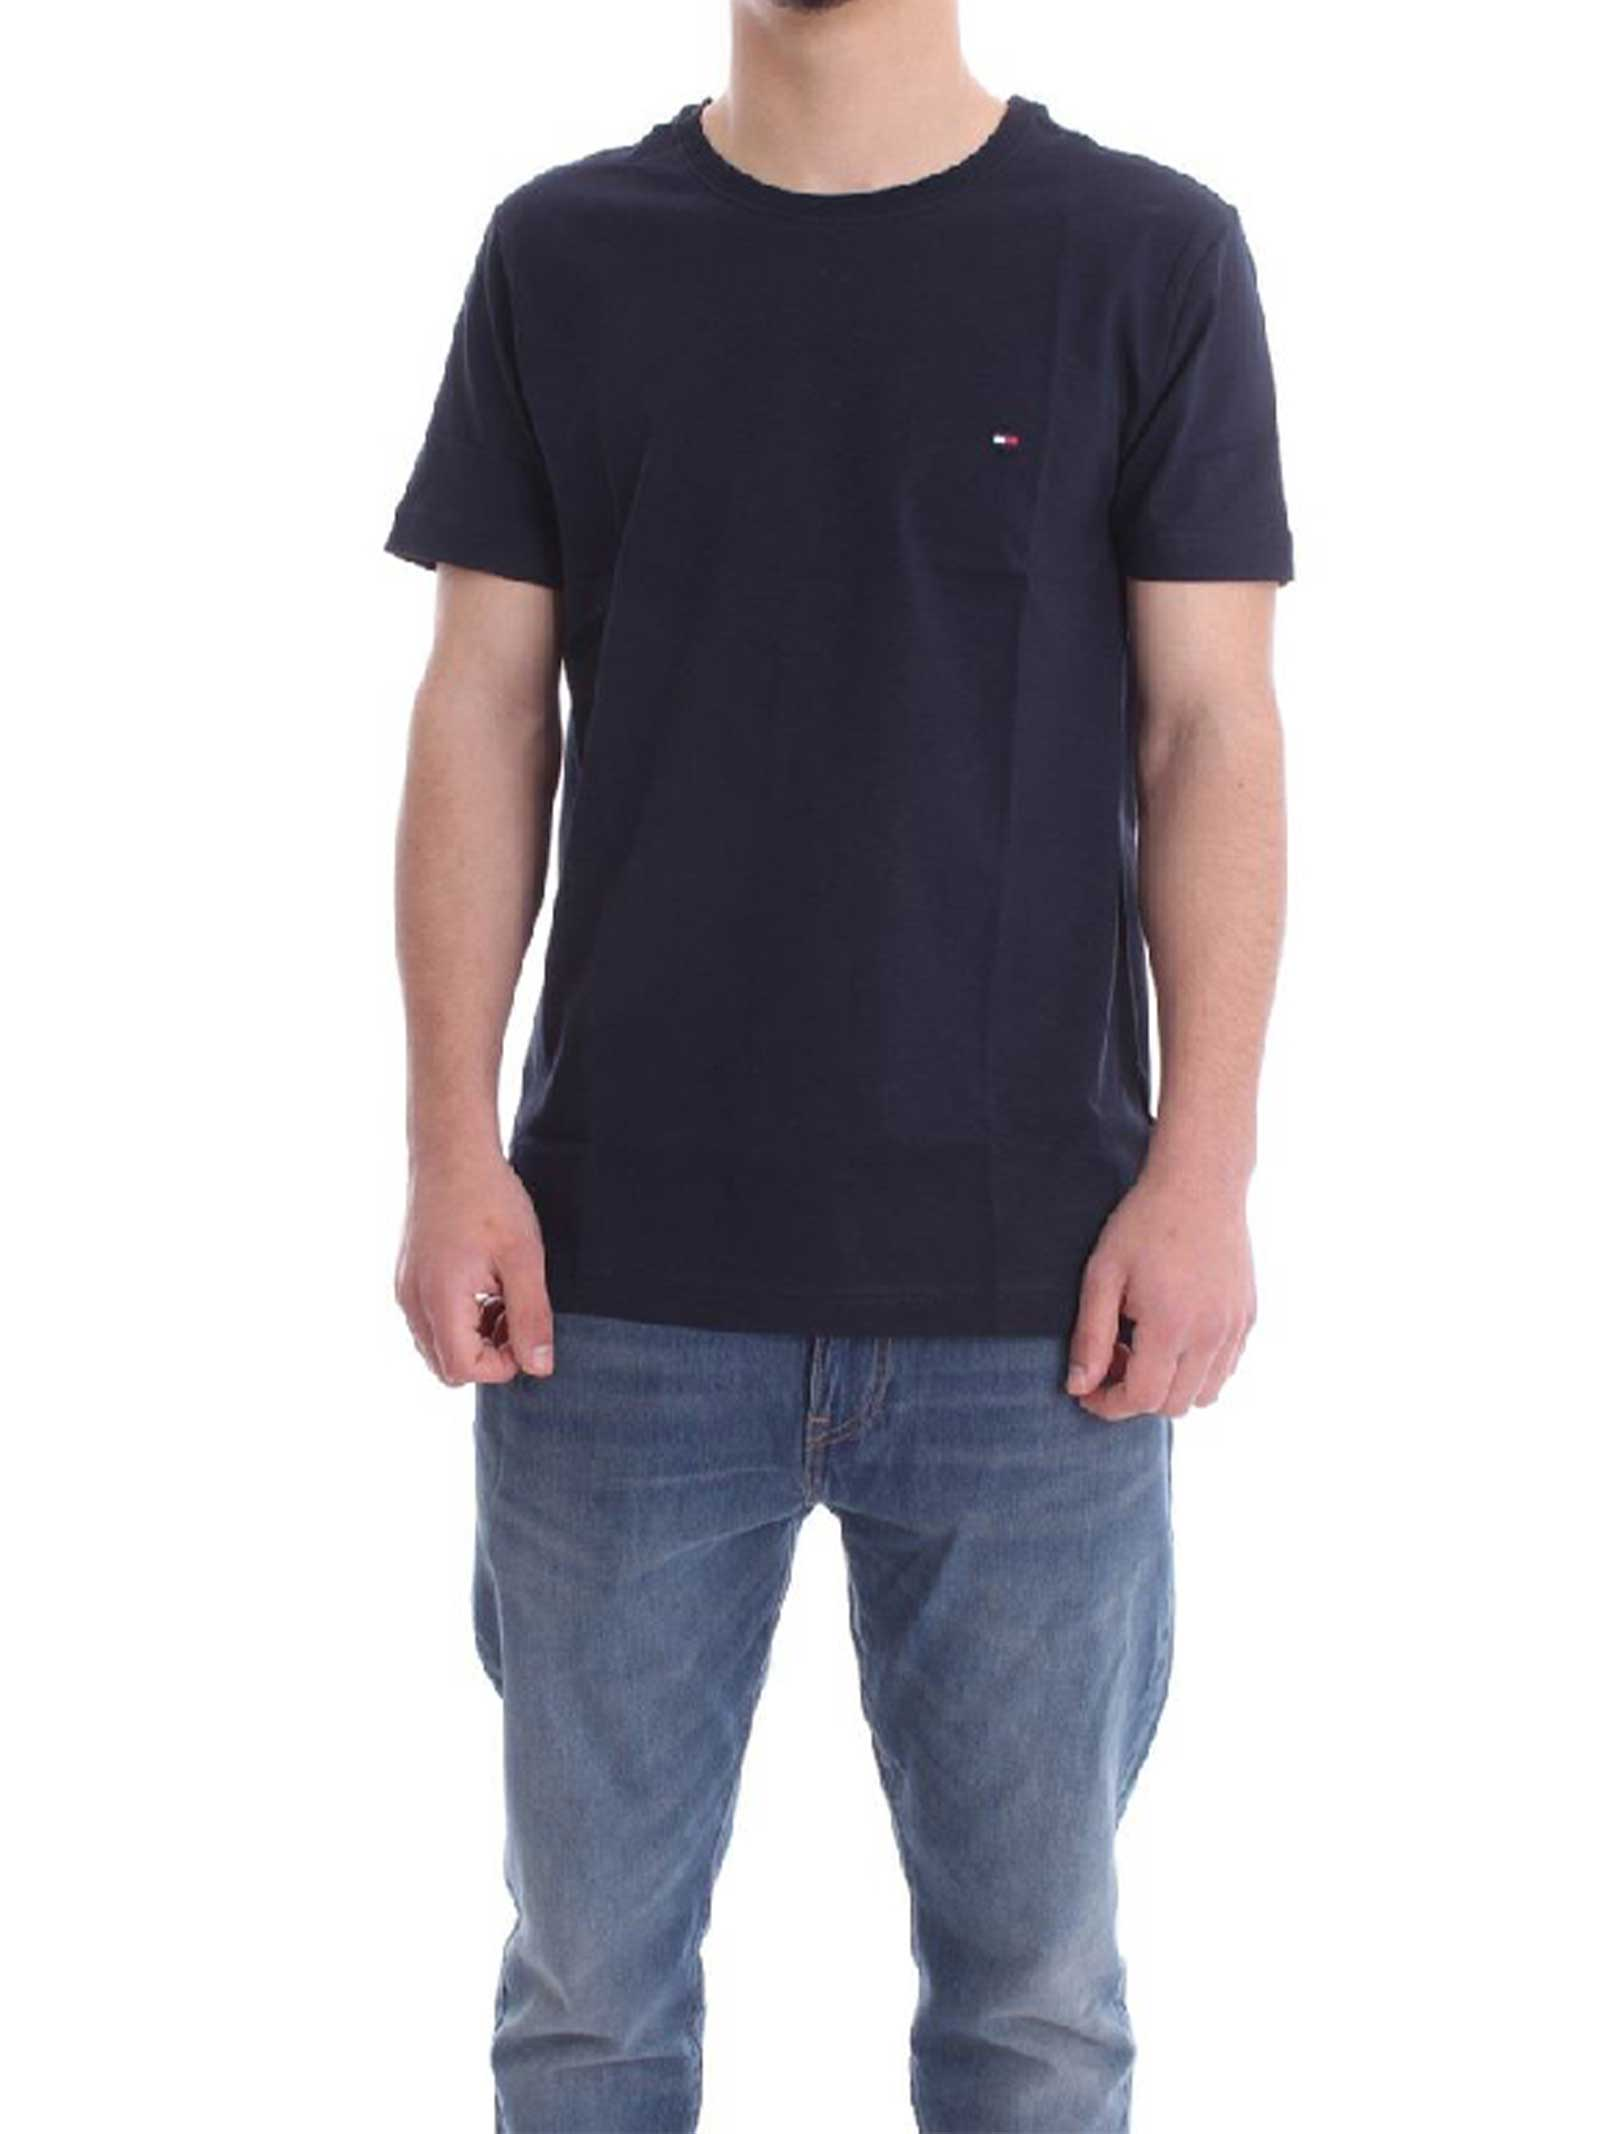 T-SHIRT UOMO TOMMY HILFIGER   T-shirt   MW0MW13344DW5